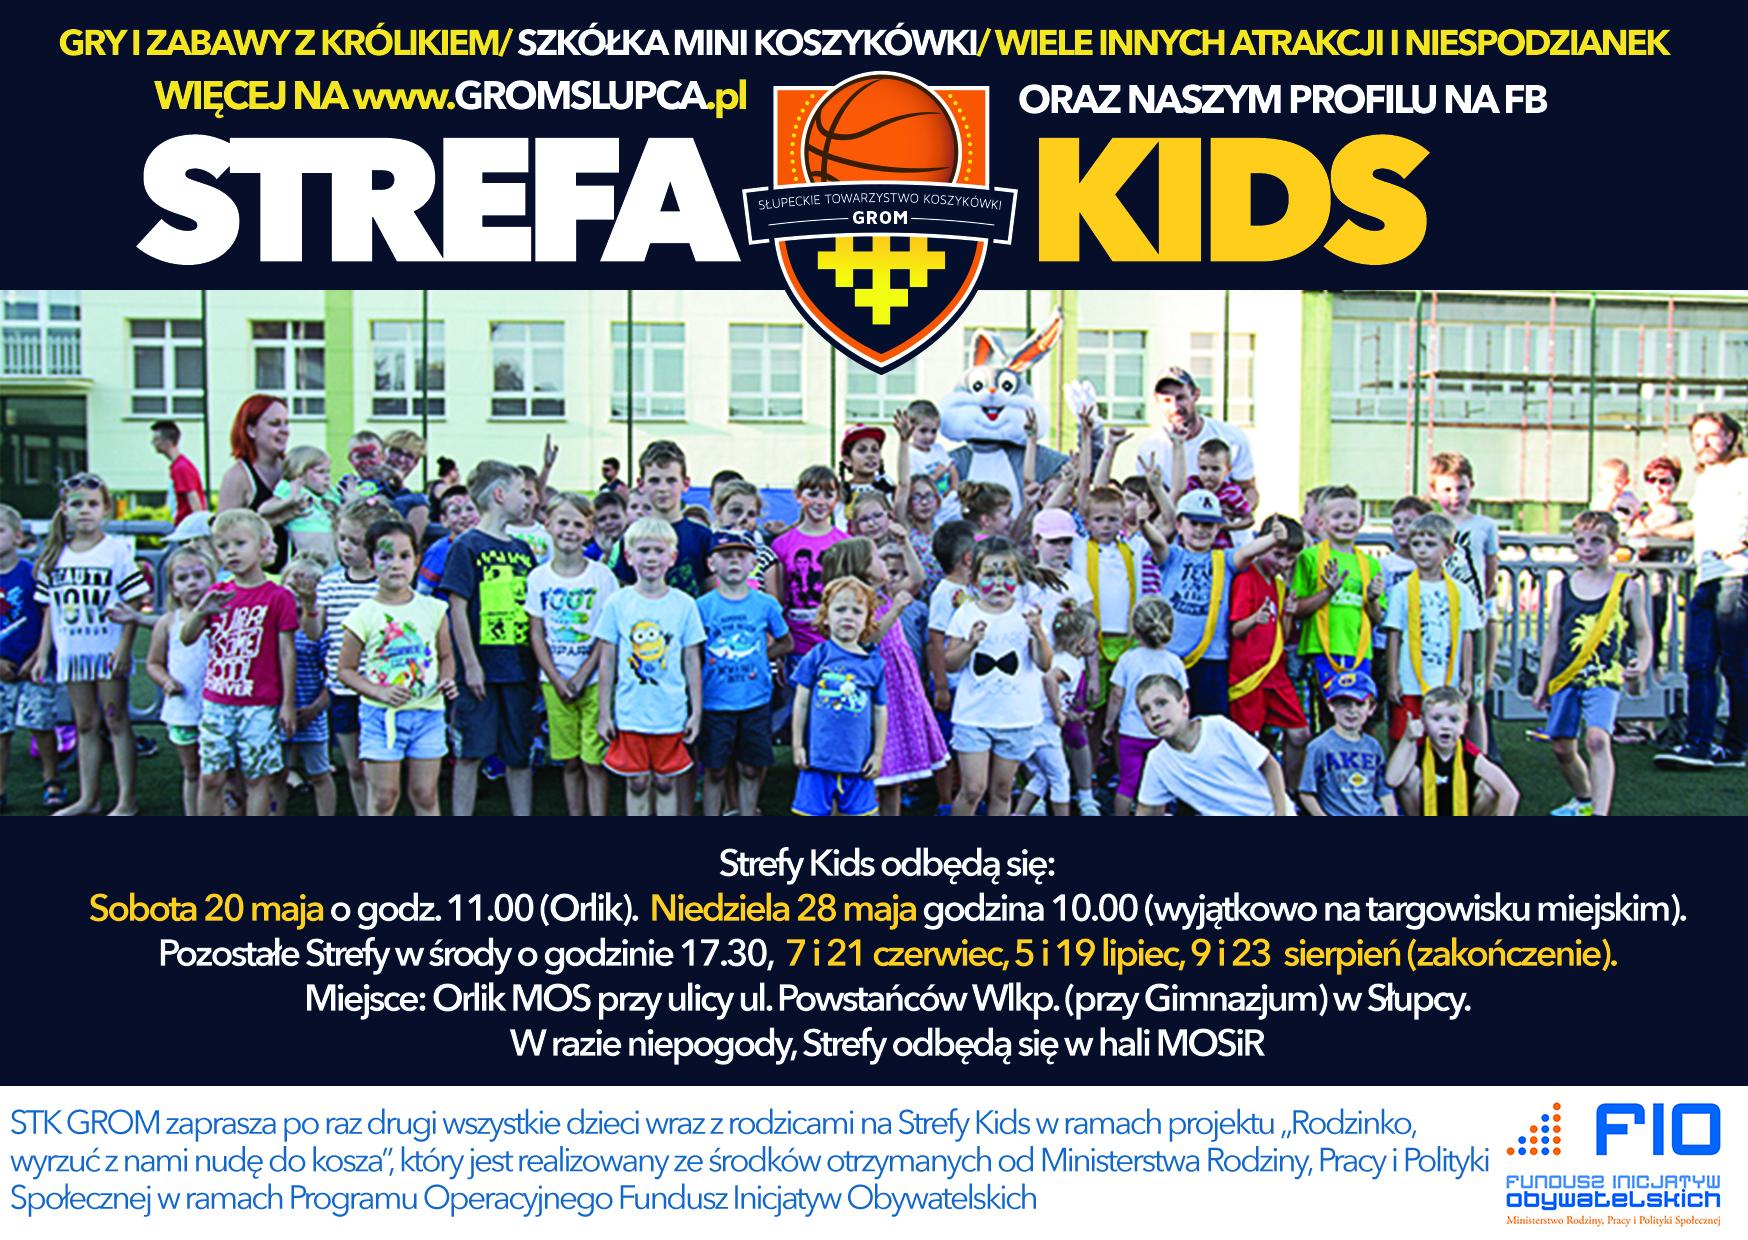 STREFA KIDS ULOTKA 2017